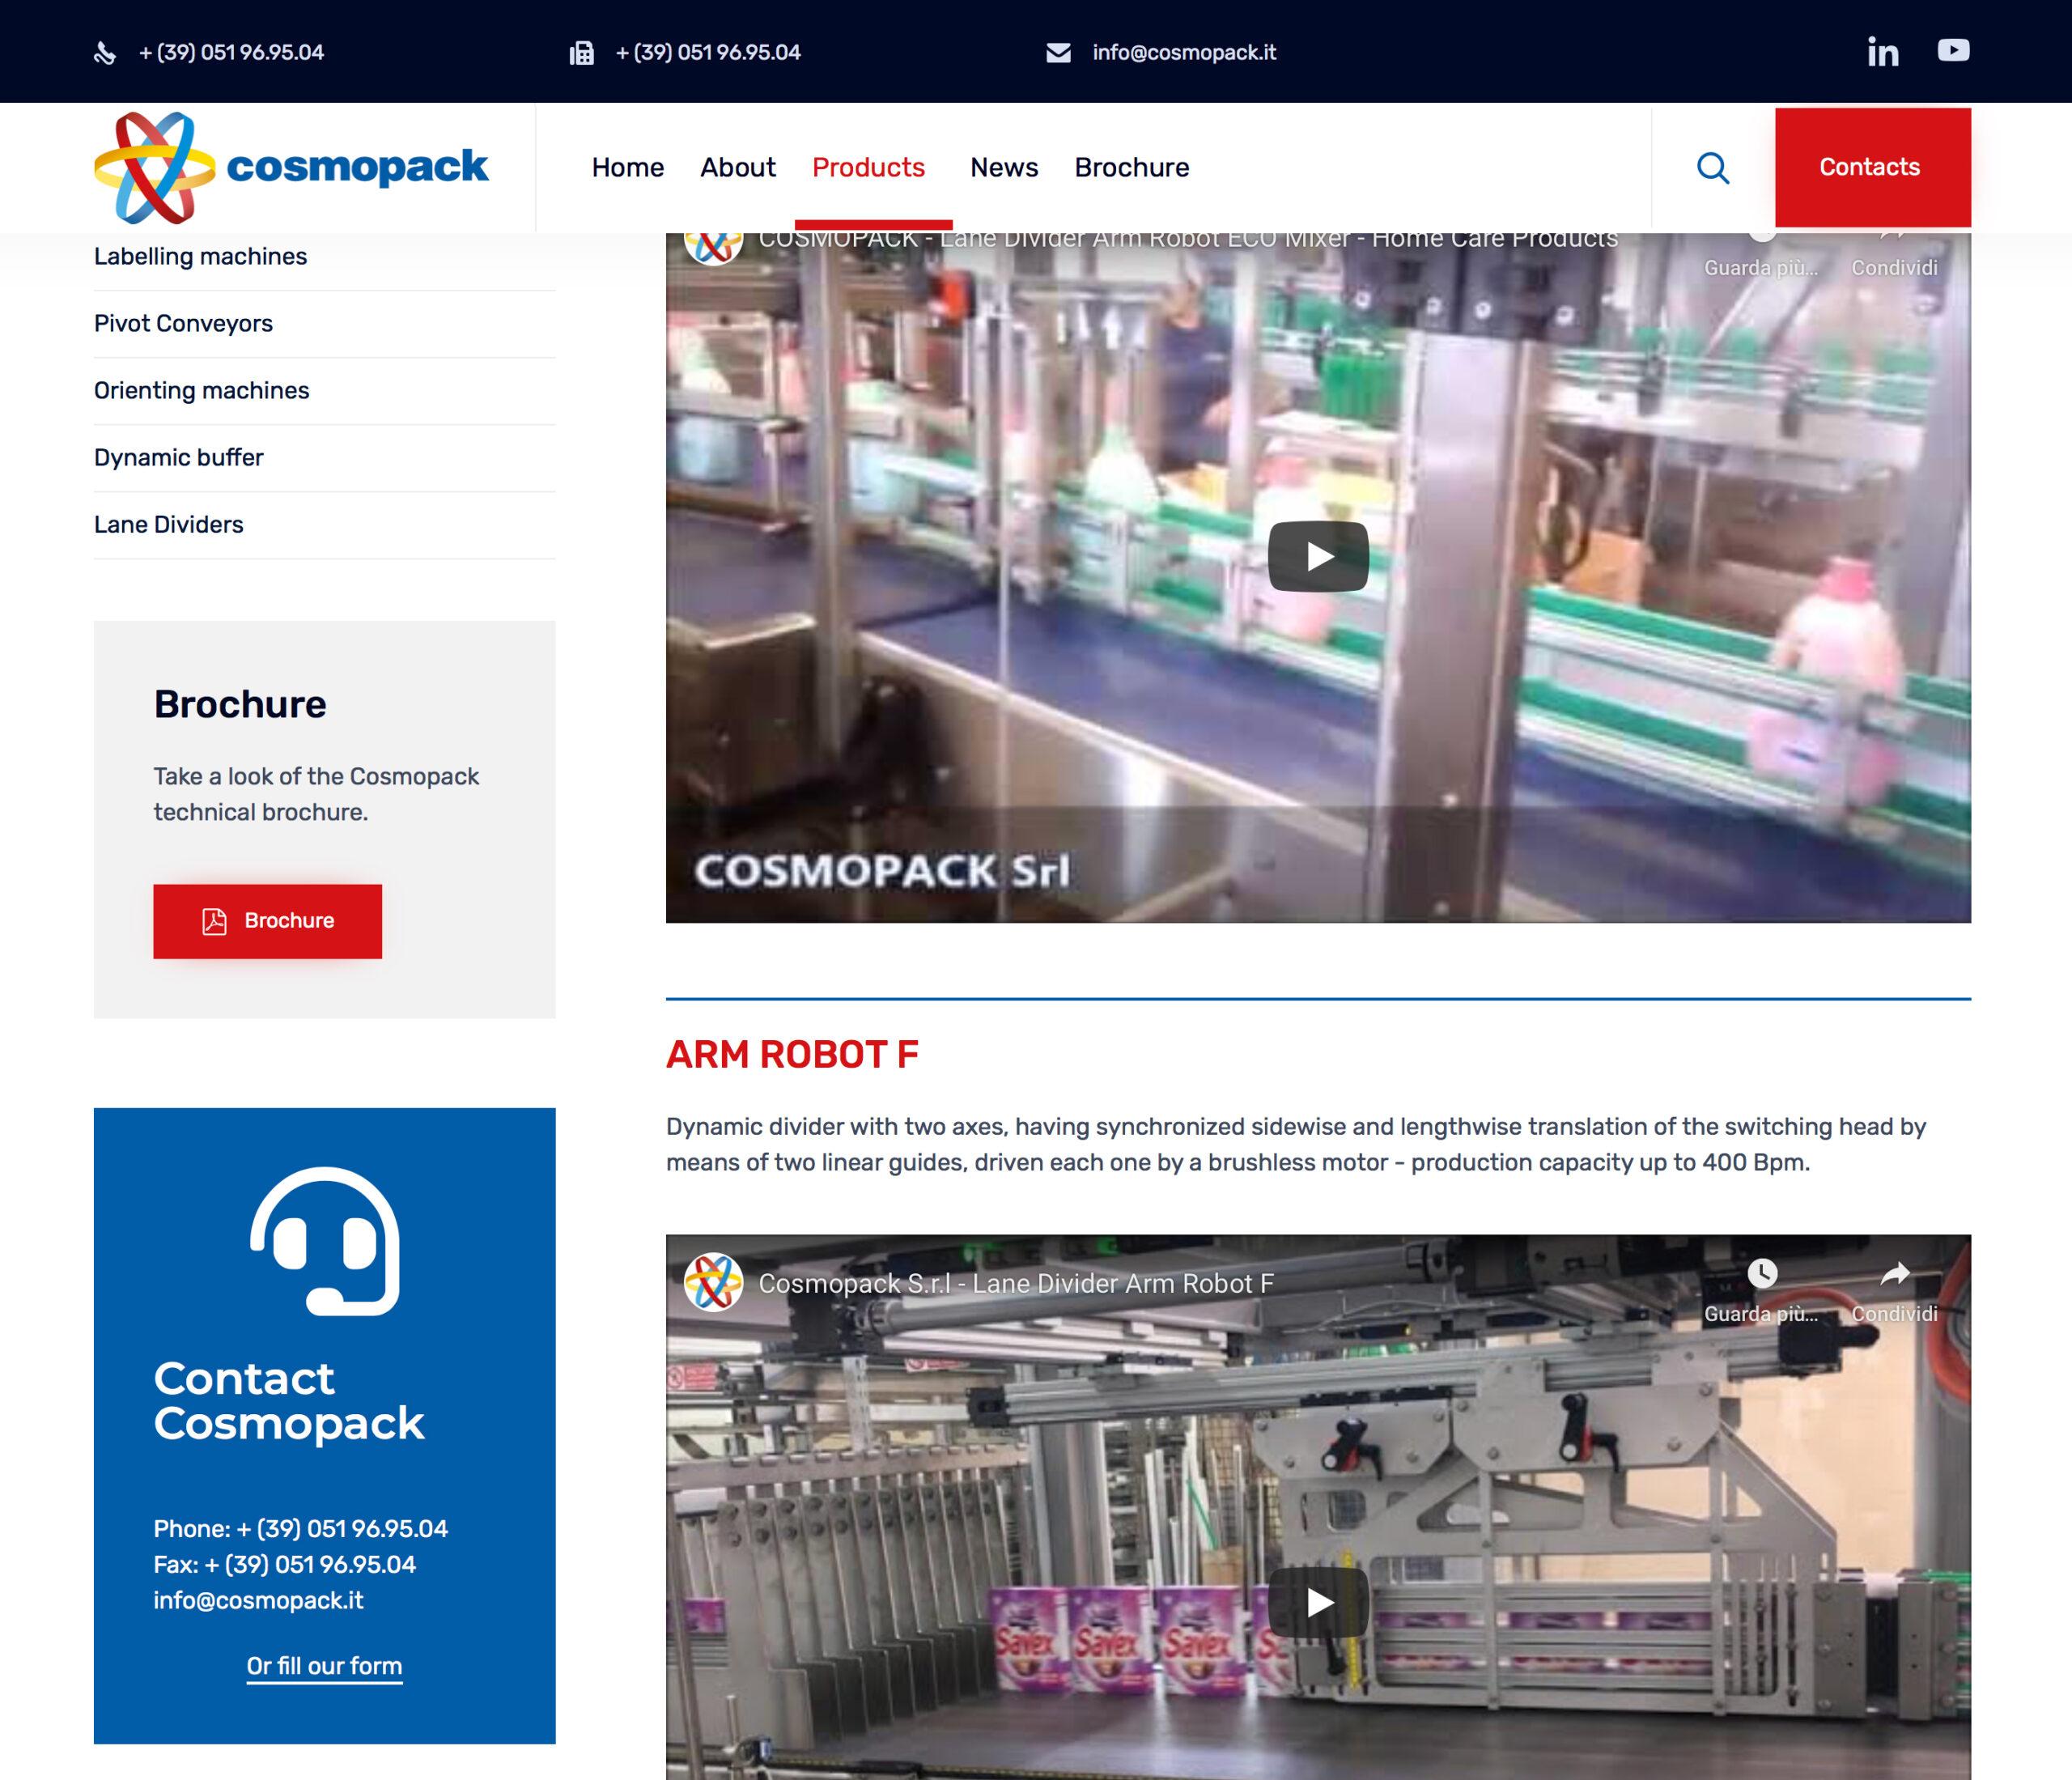 cosmopack-new-web-site-03